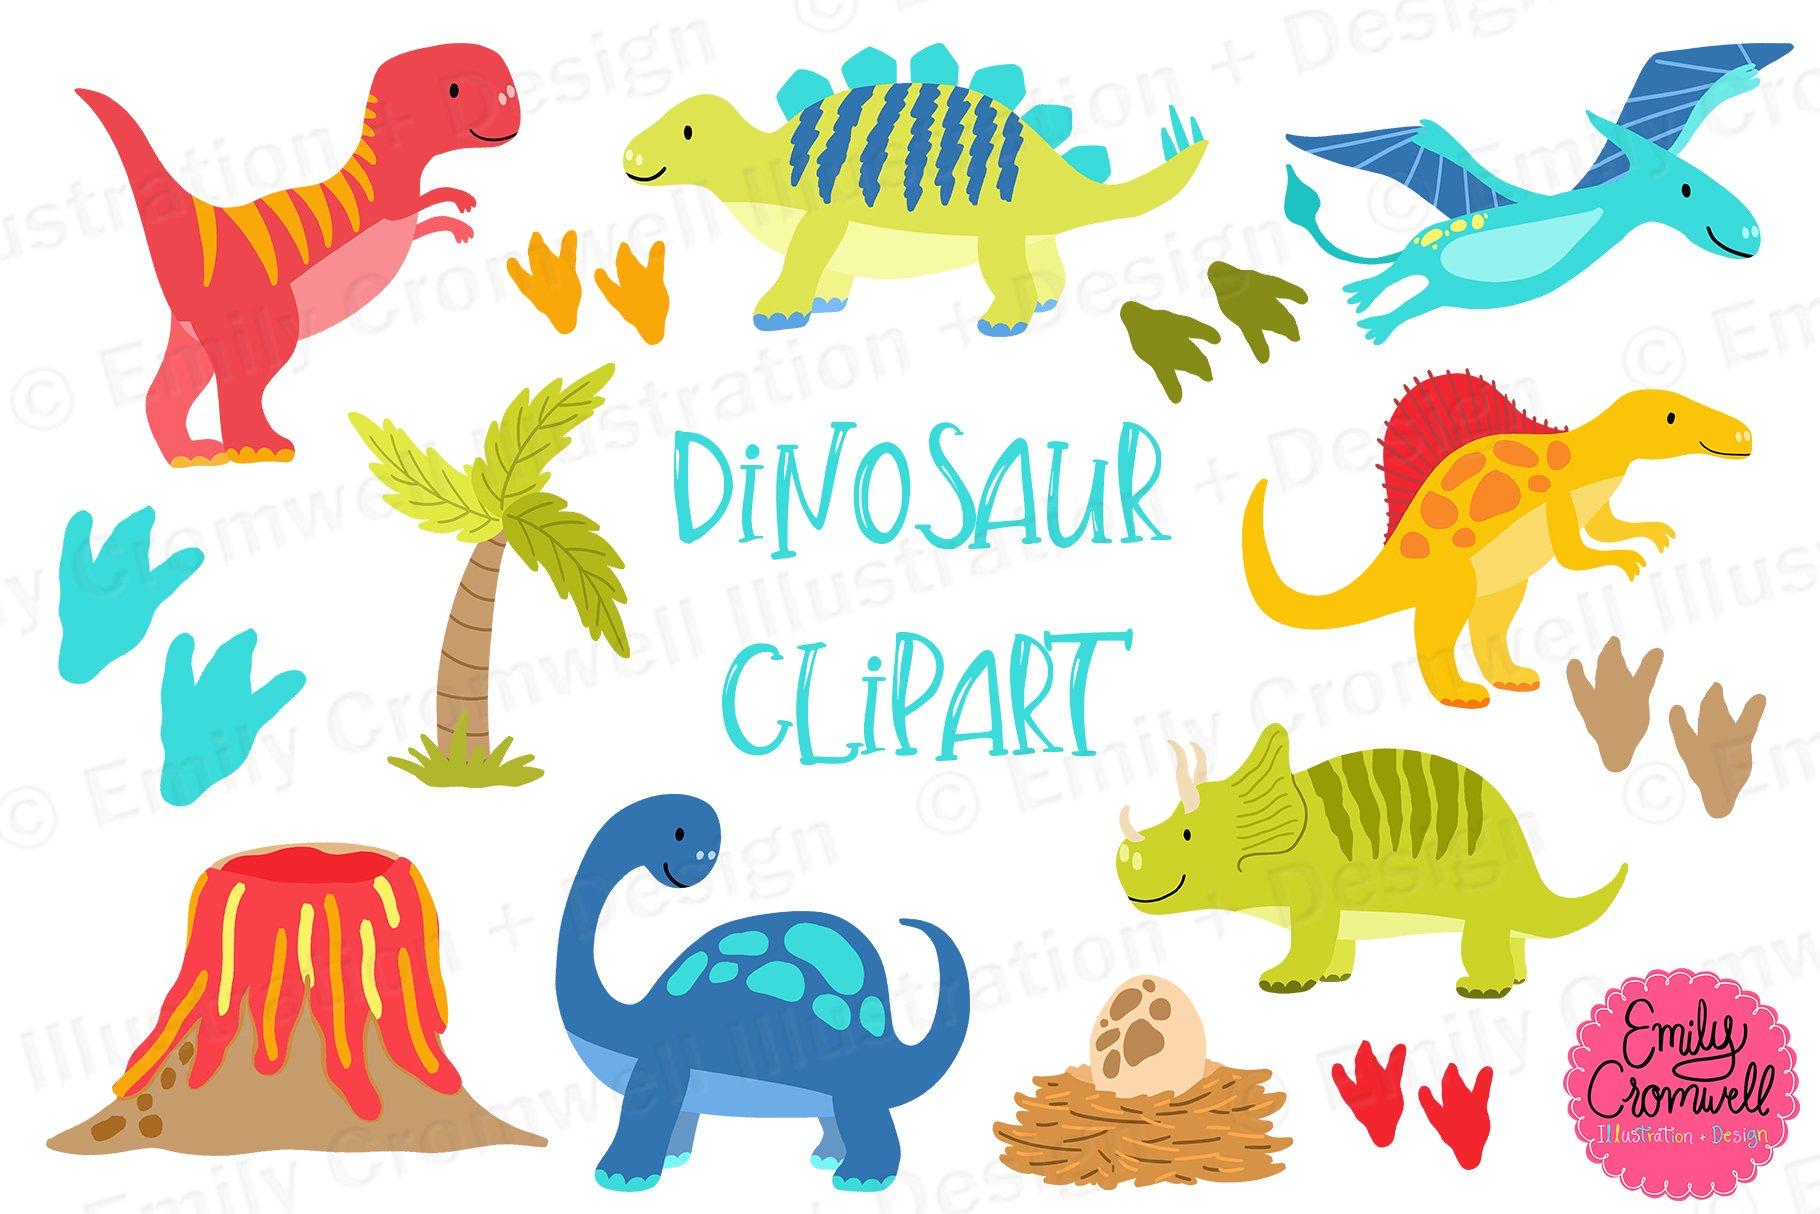 Dinosaur Clipart Pre Designed Photoshop Graphics Creative Market